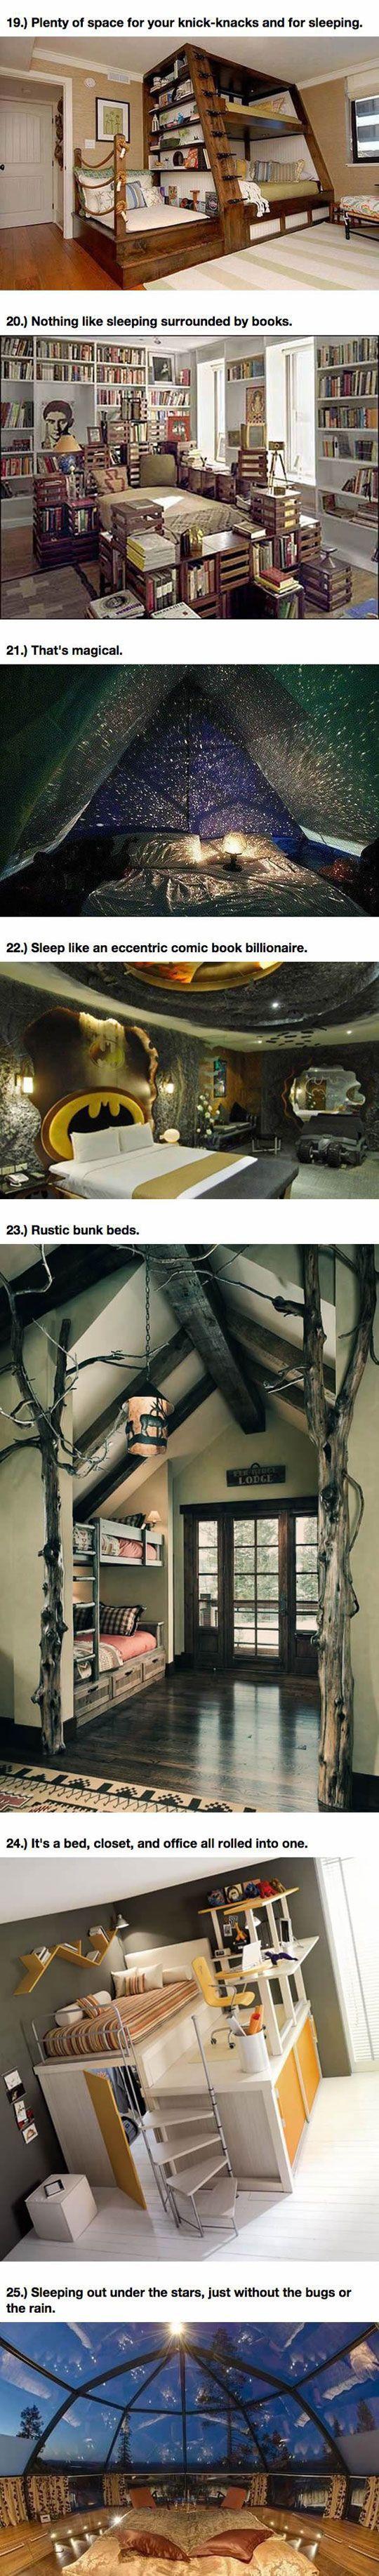 Best bed designs ever: